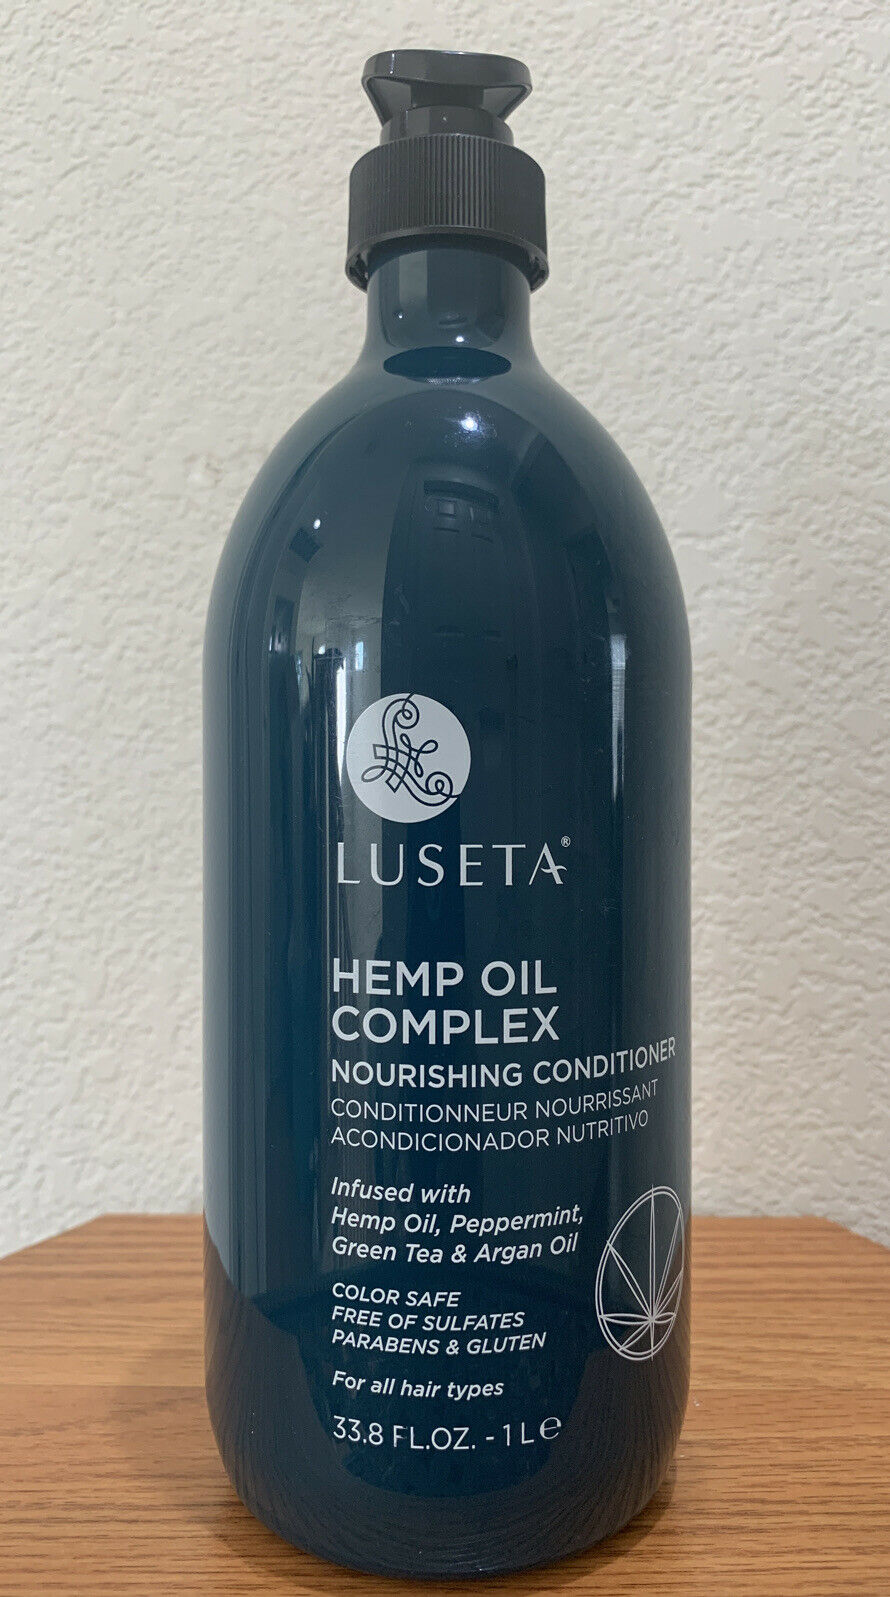 Luseta HEMP OIL COMPLEX Nourishing Conditioner w/ Hemp Oil, 33.8 fl oz New